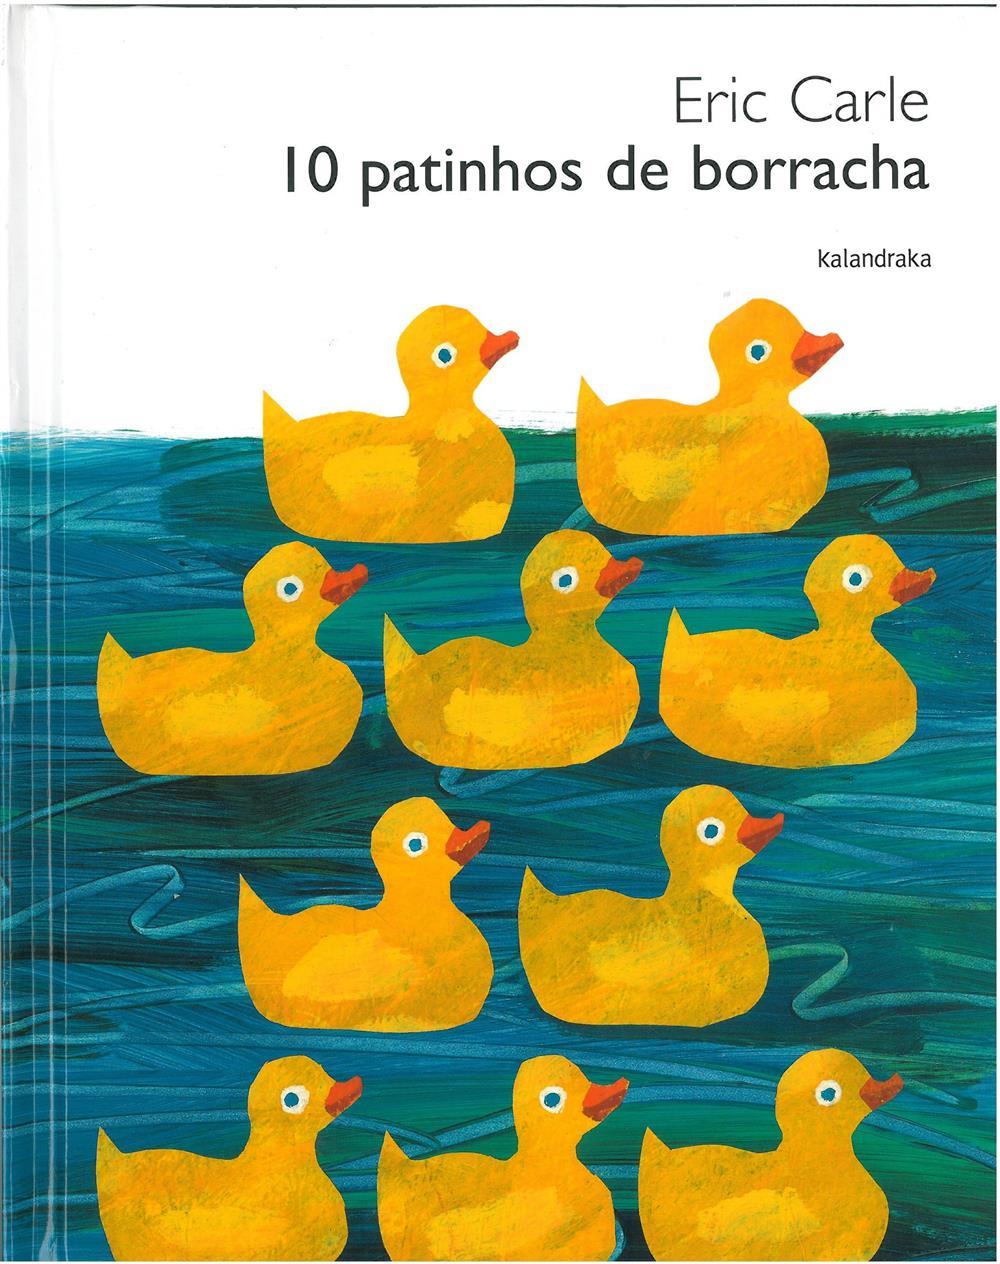 10 patinhos de borracha_.jpg